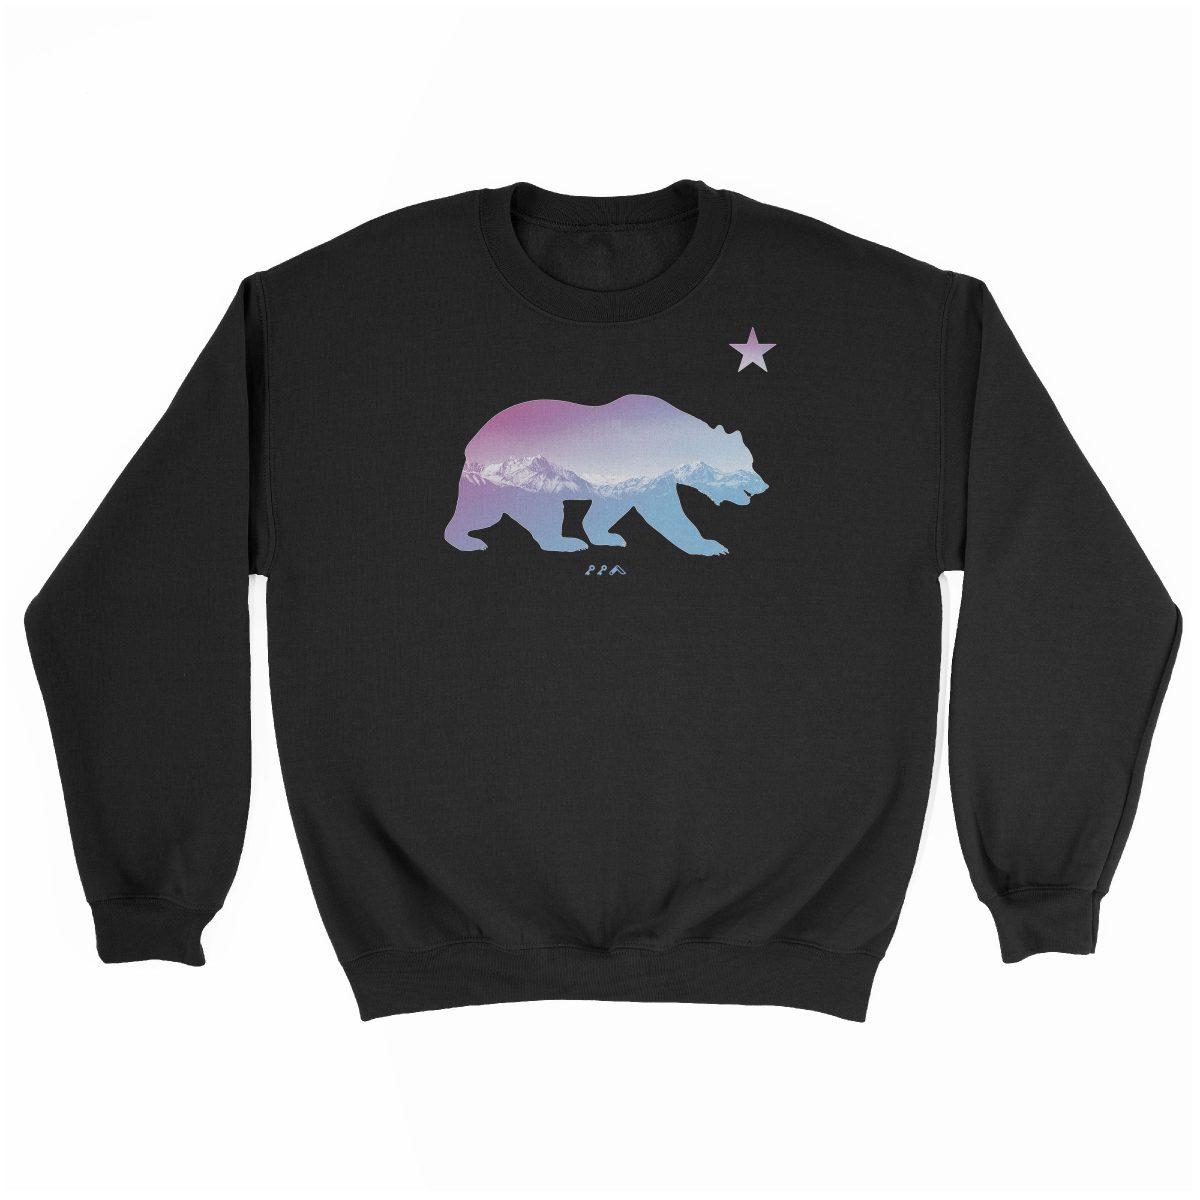 """BARE MOUNTAINS"" california bear sweatshirts in black by kikicutt"